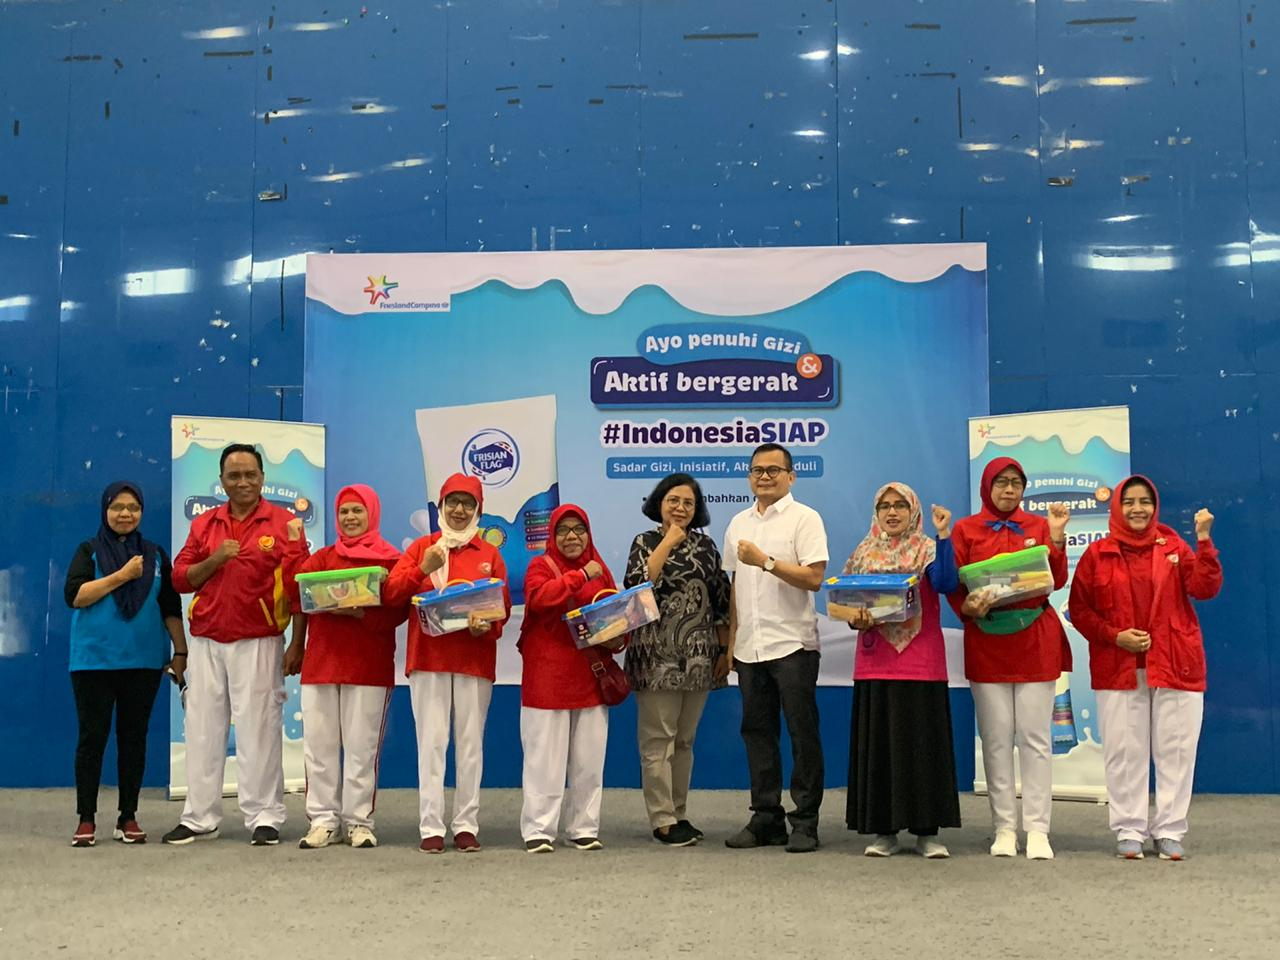 Edukasi Gizi Seimbang #IndonesiaSIAP